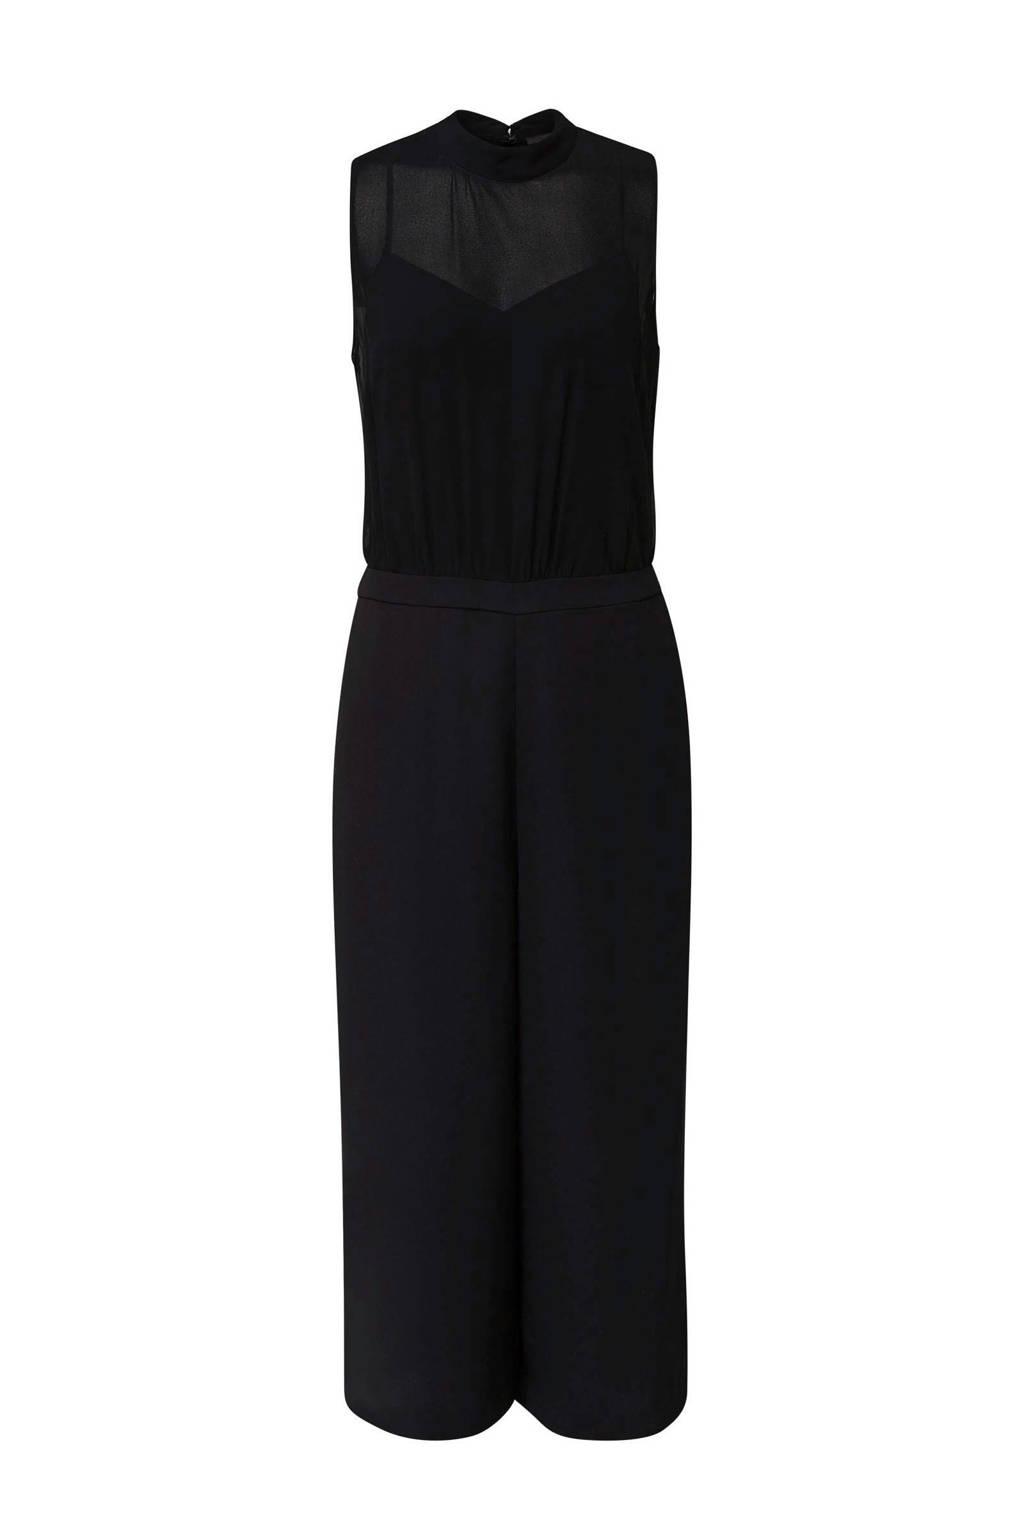 ESPRIT Women Collection jumpsuit zwart, Zwart